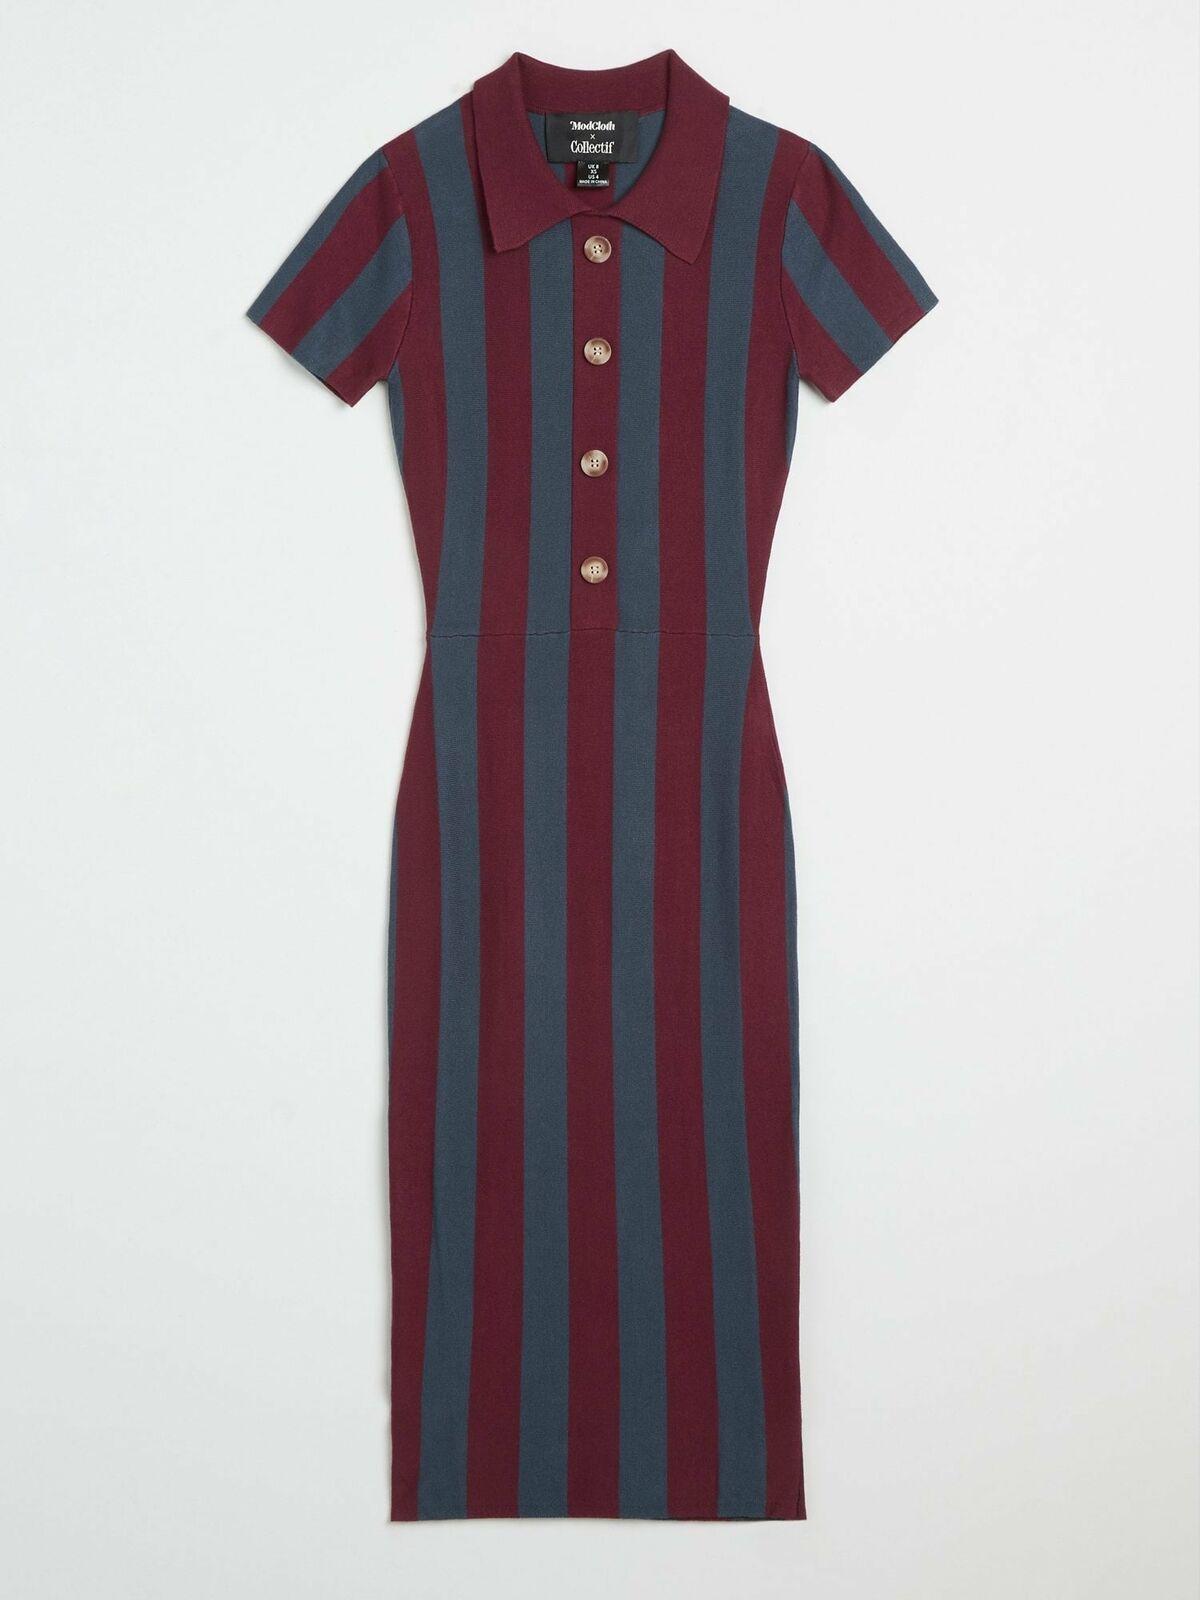 Collectif X Modcloth Maya Knitted Stripe Pencil Dress Wine/Blue UK10